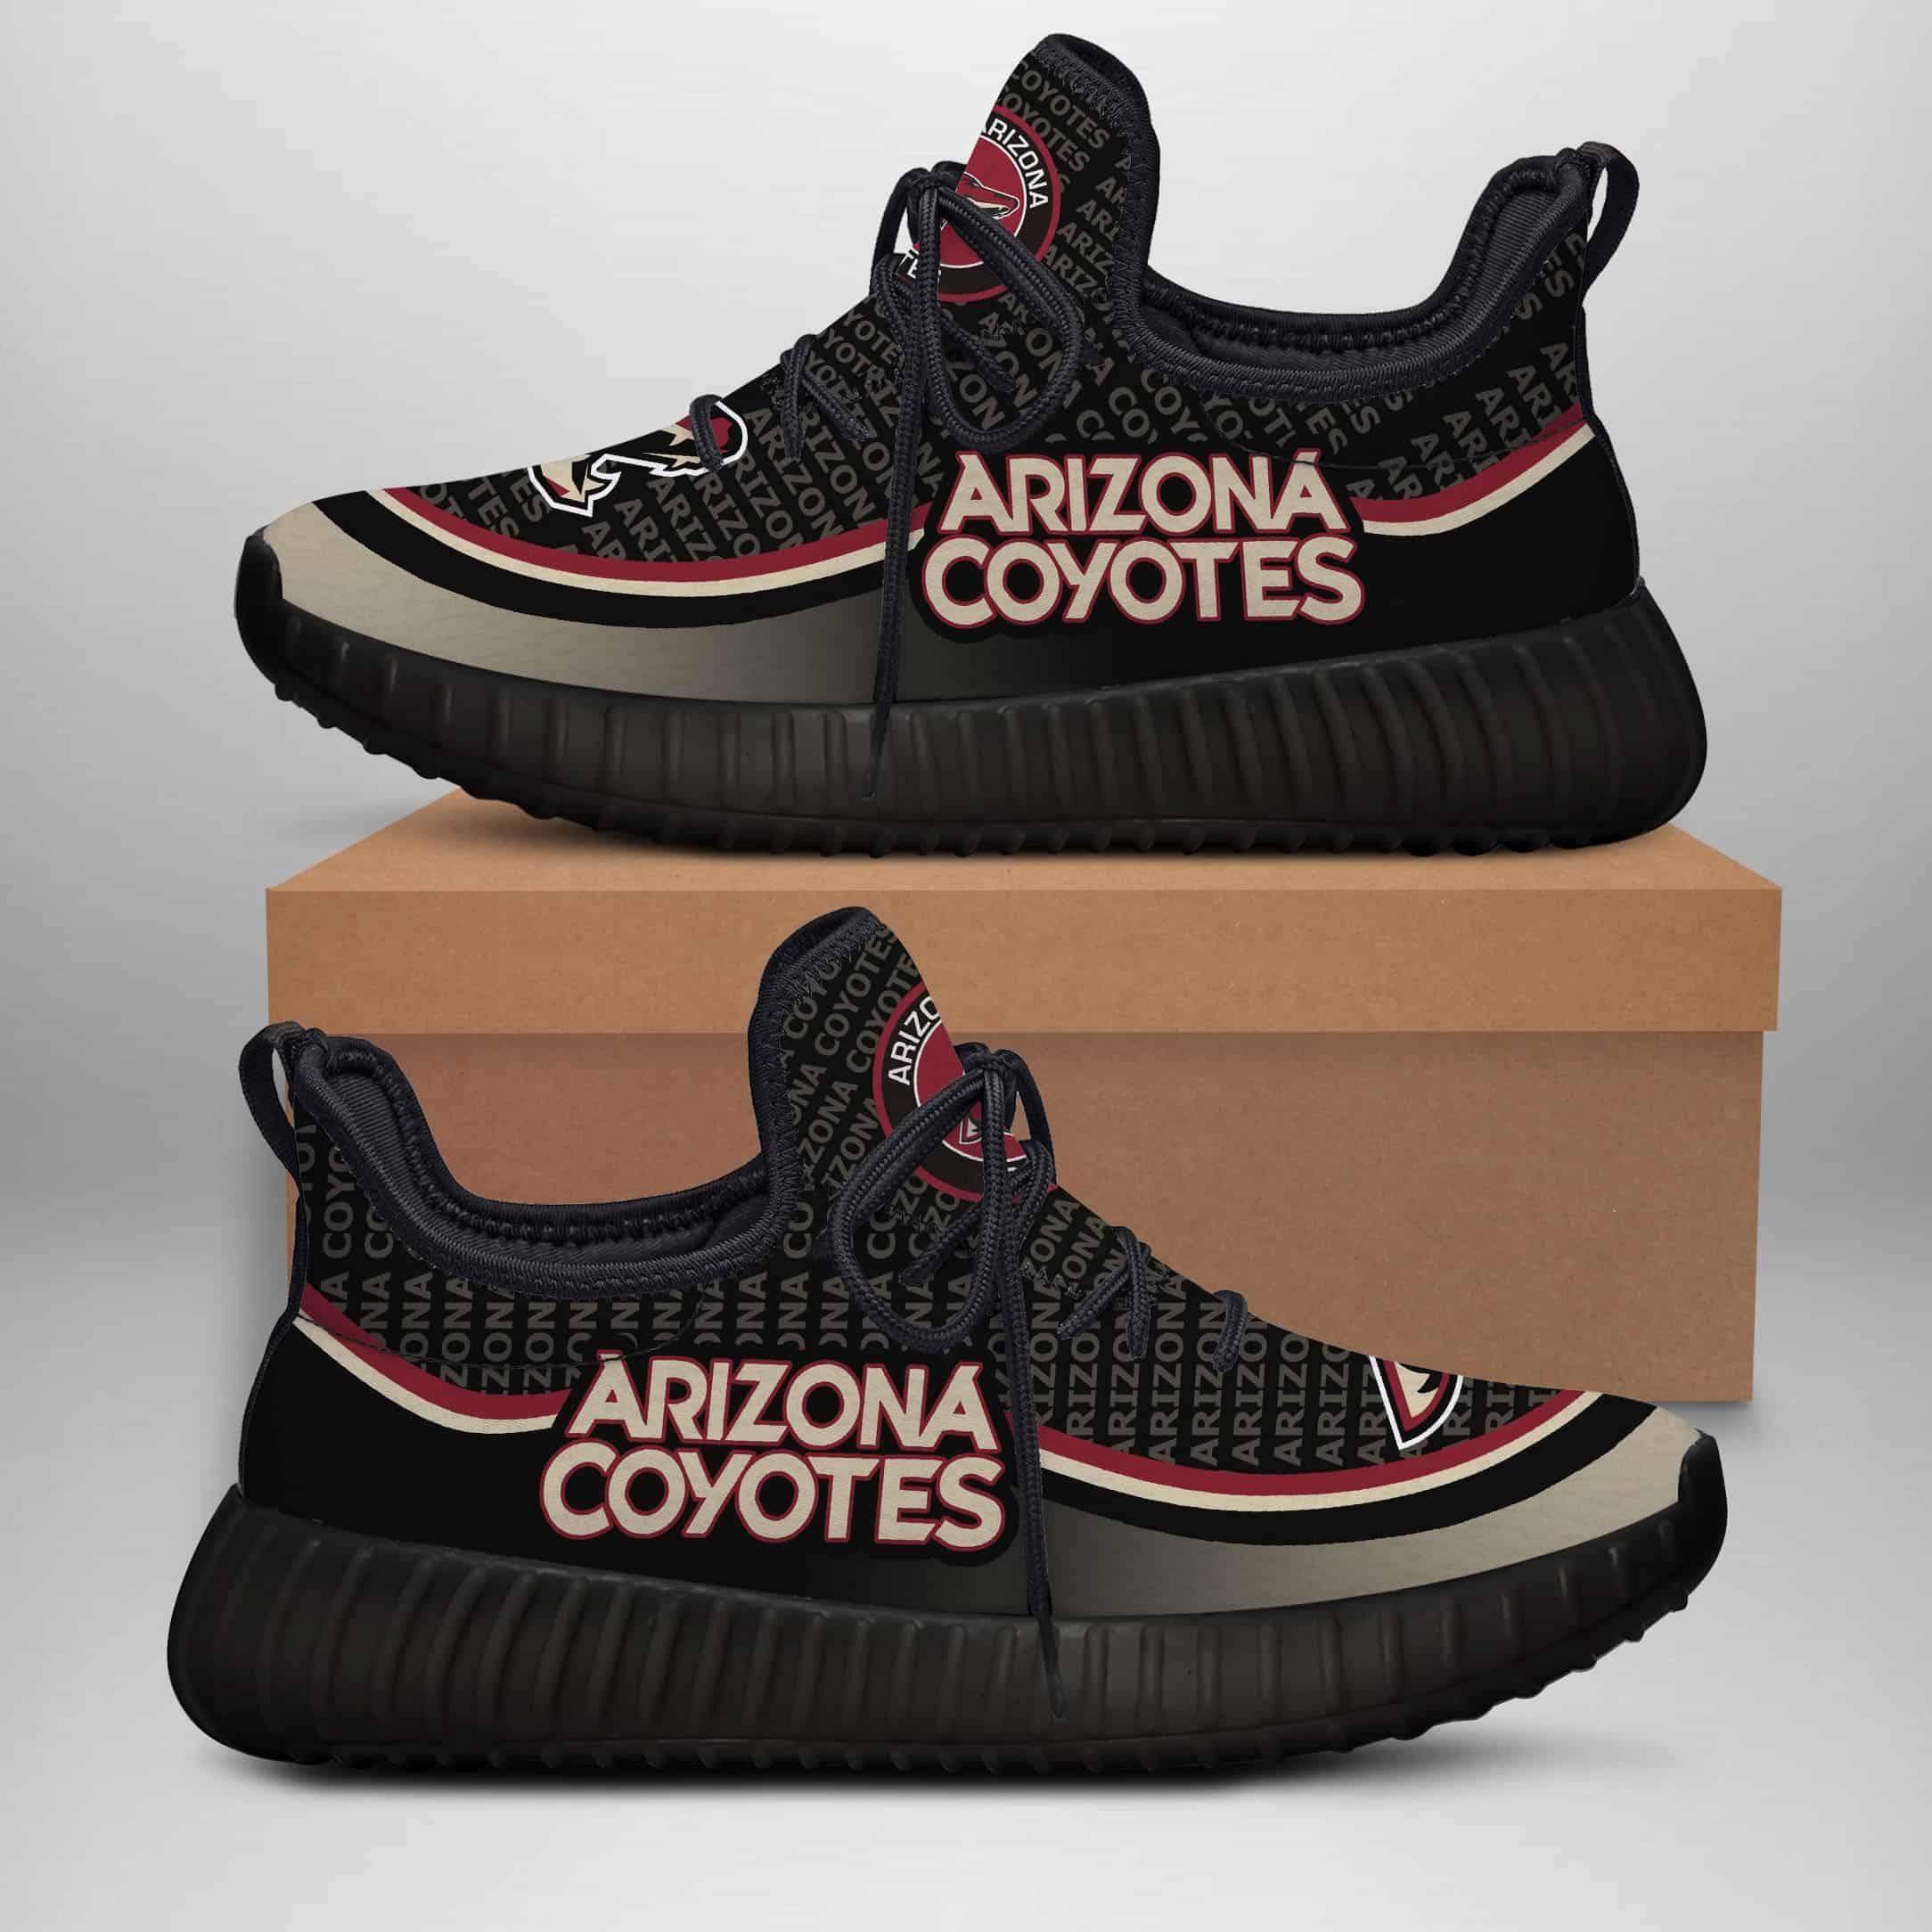 Arizona Coyotes Custom New Yeezy Sneaker